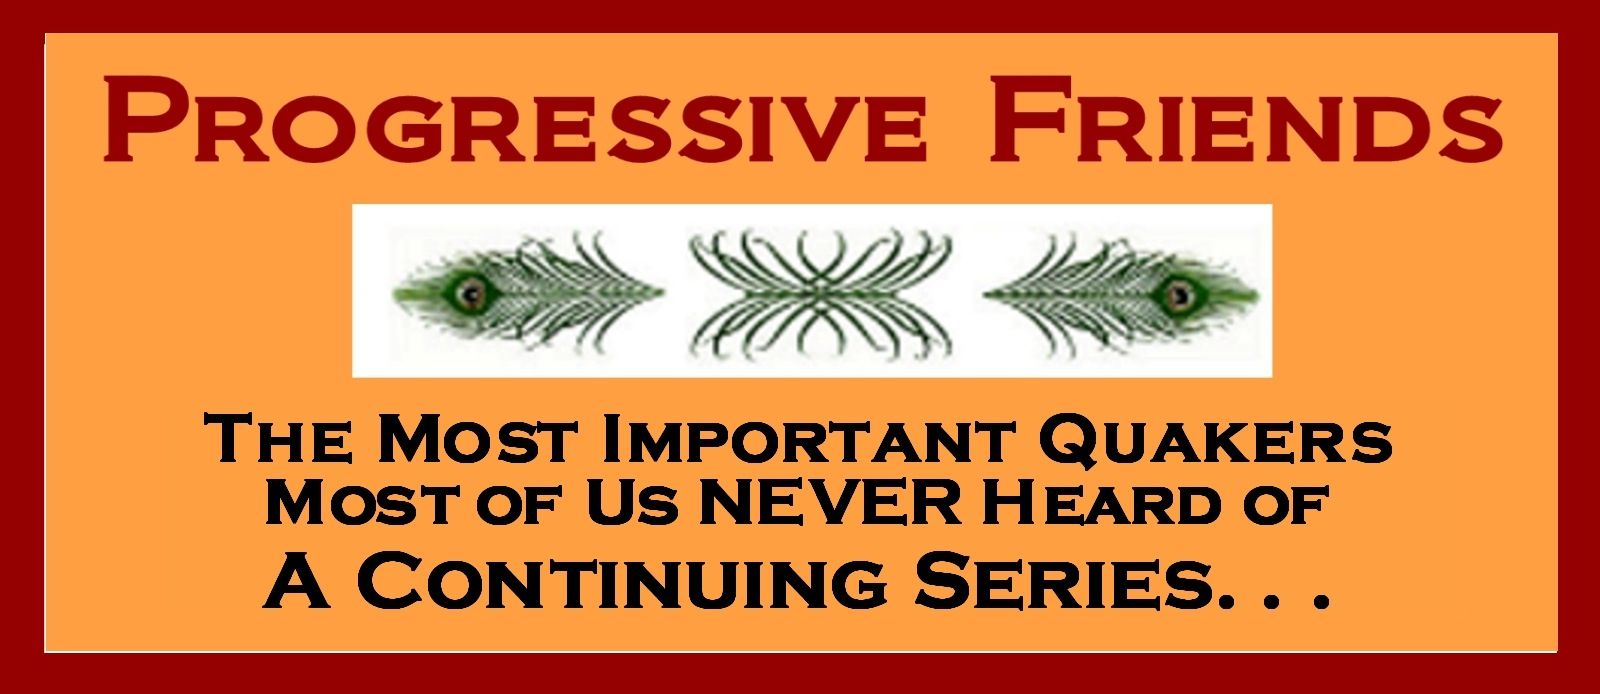 Progressive Friends -- A Continuing Series